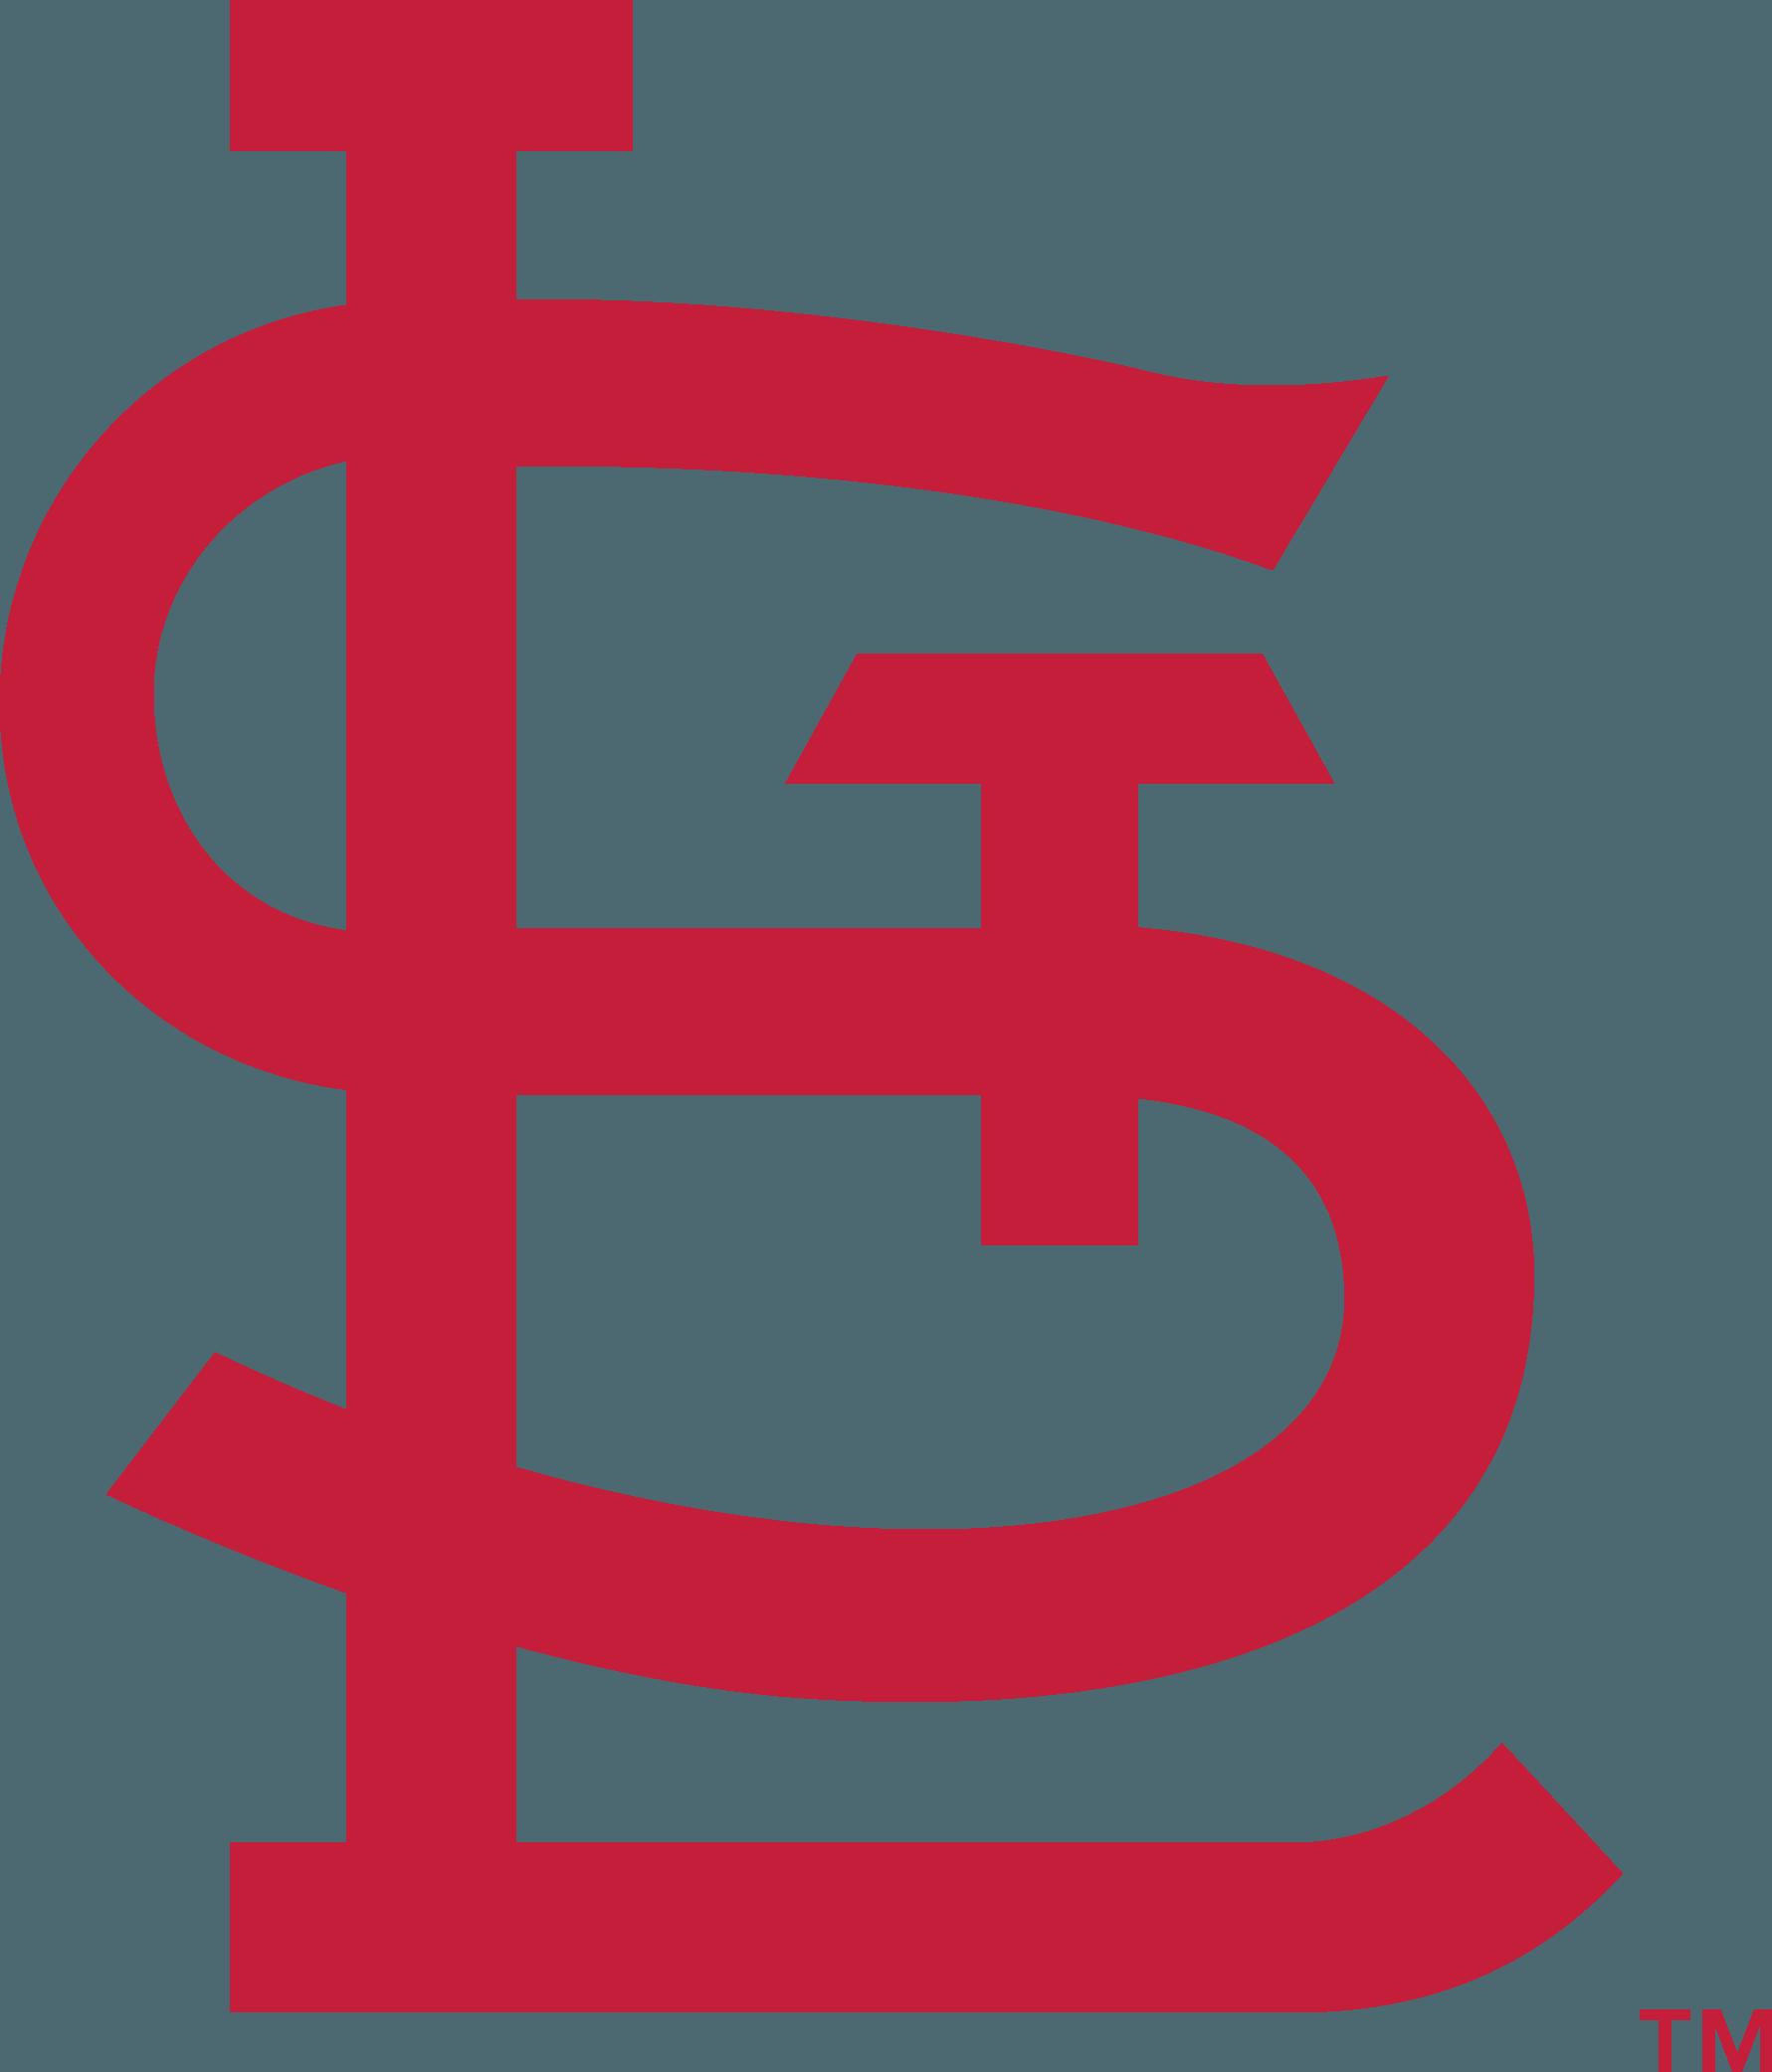 St Louis Cardinals Logo Png Image St Louis Cardinals Baseball St Louis Cardinals St Louis Cardinals Gifts